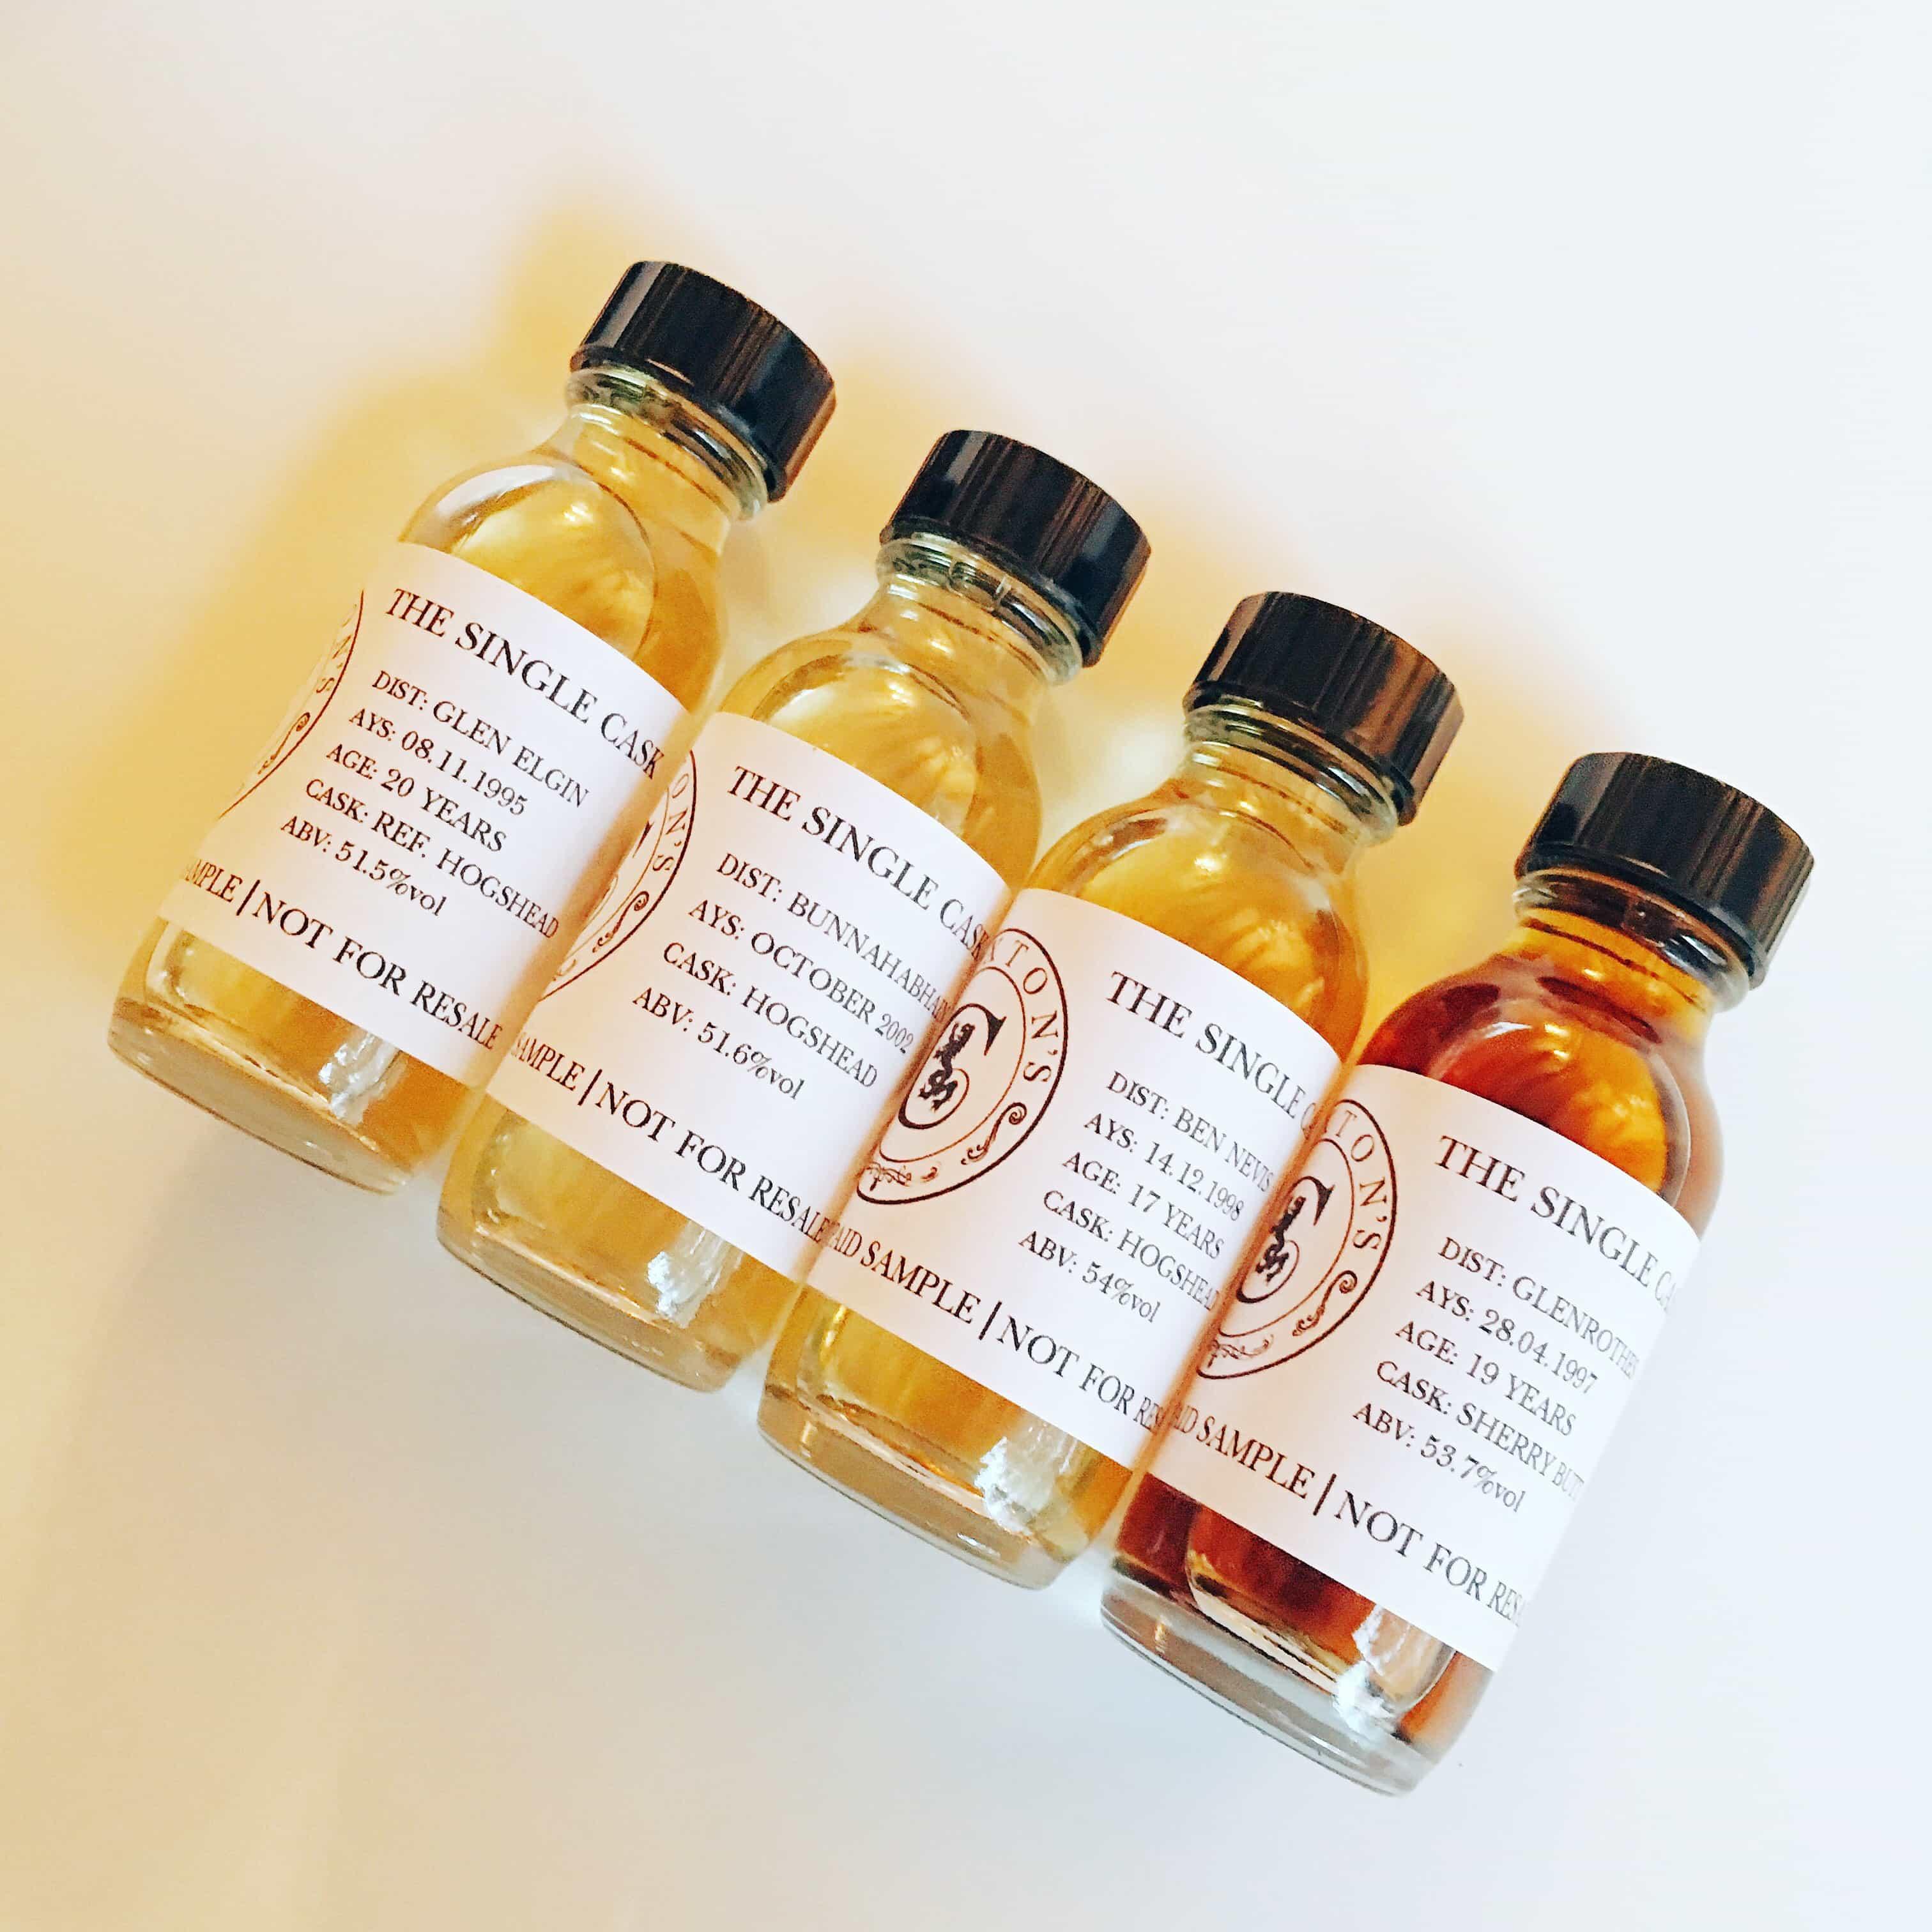 4 claxton's whiskies